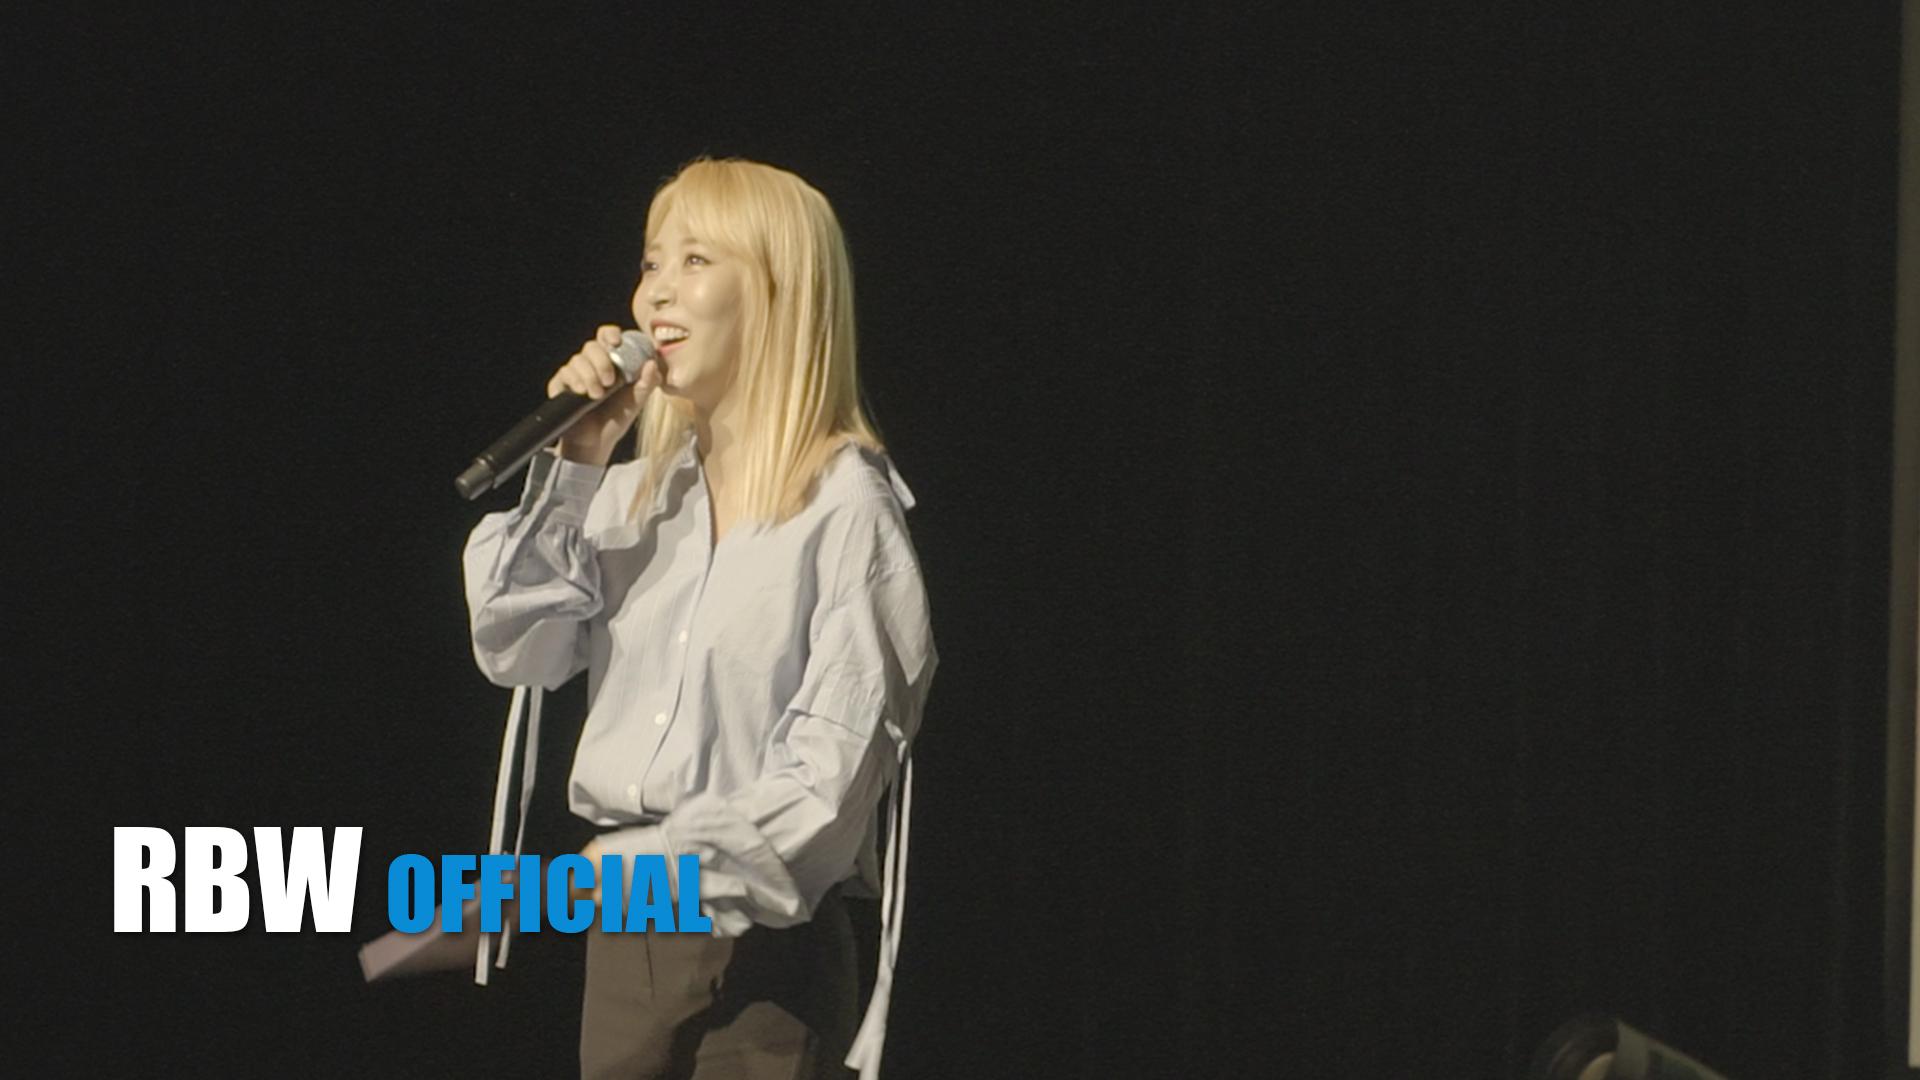 [Special]소문난 별다방 공개방송 비하인드